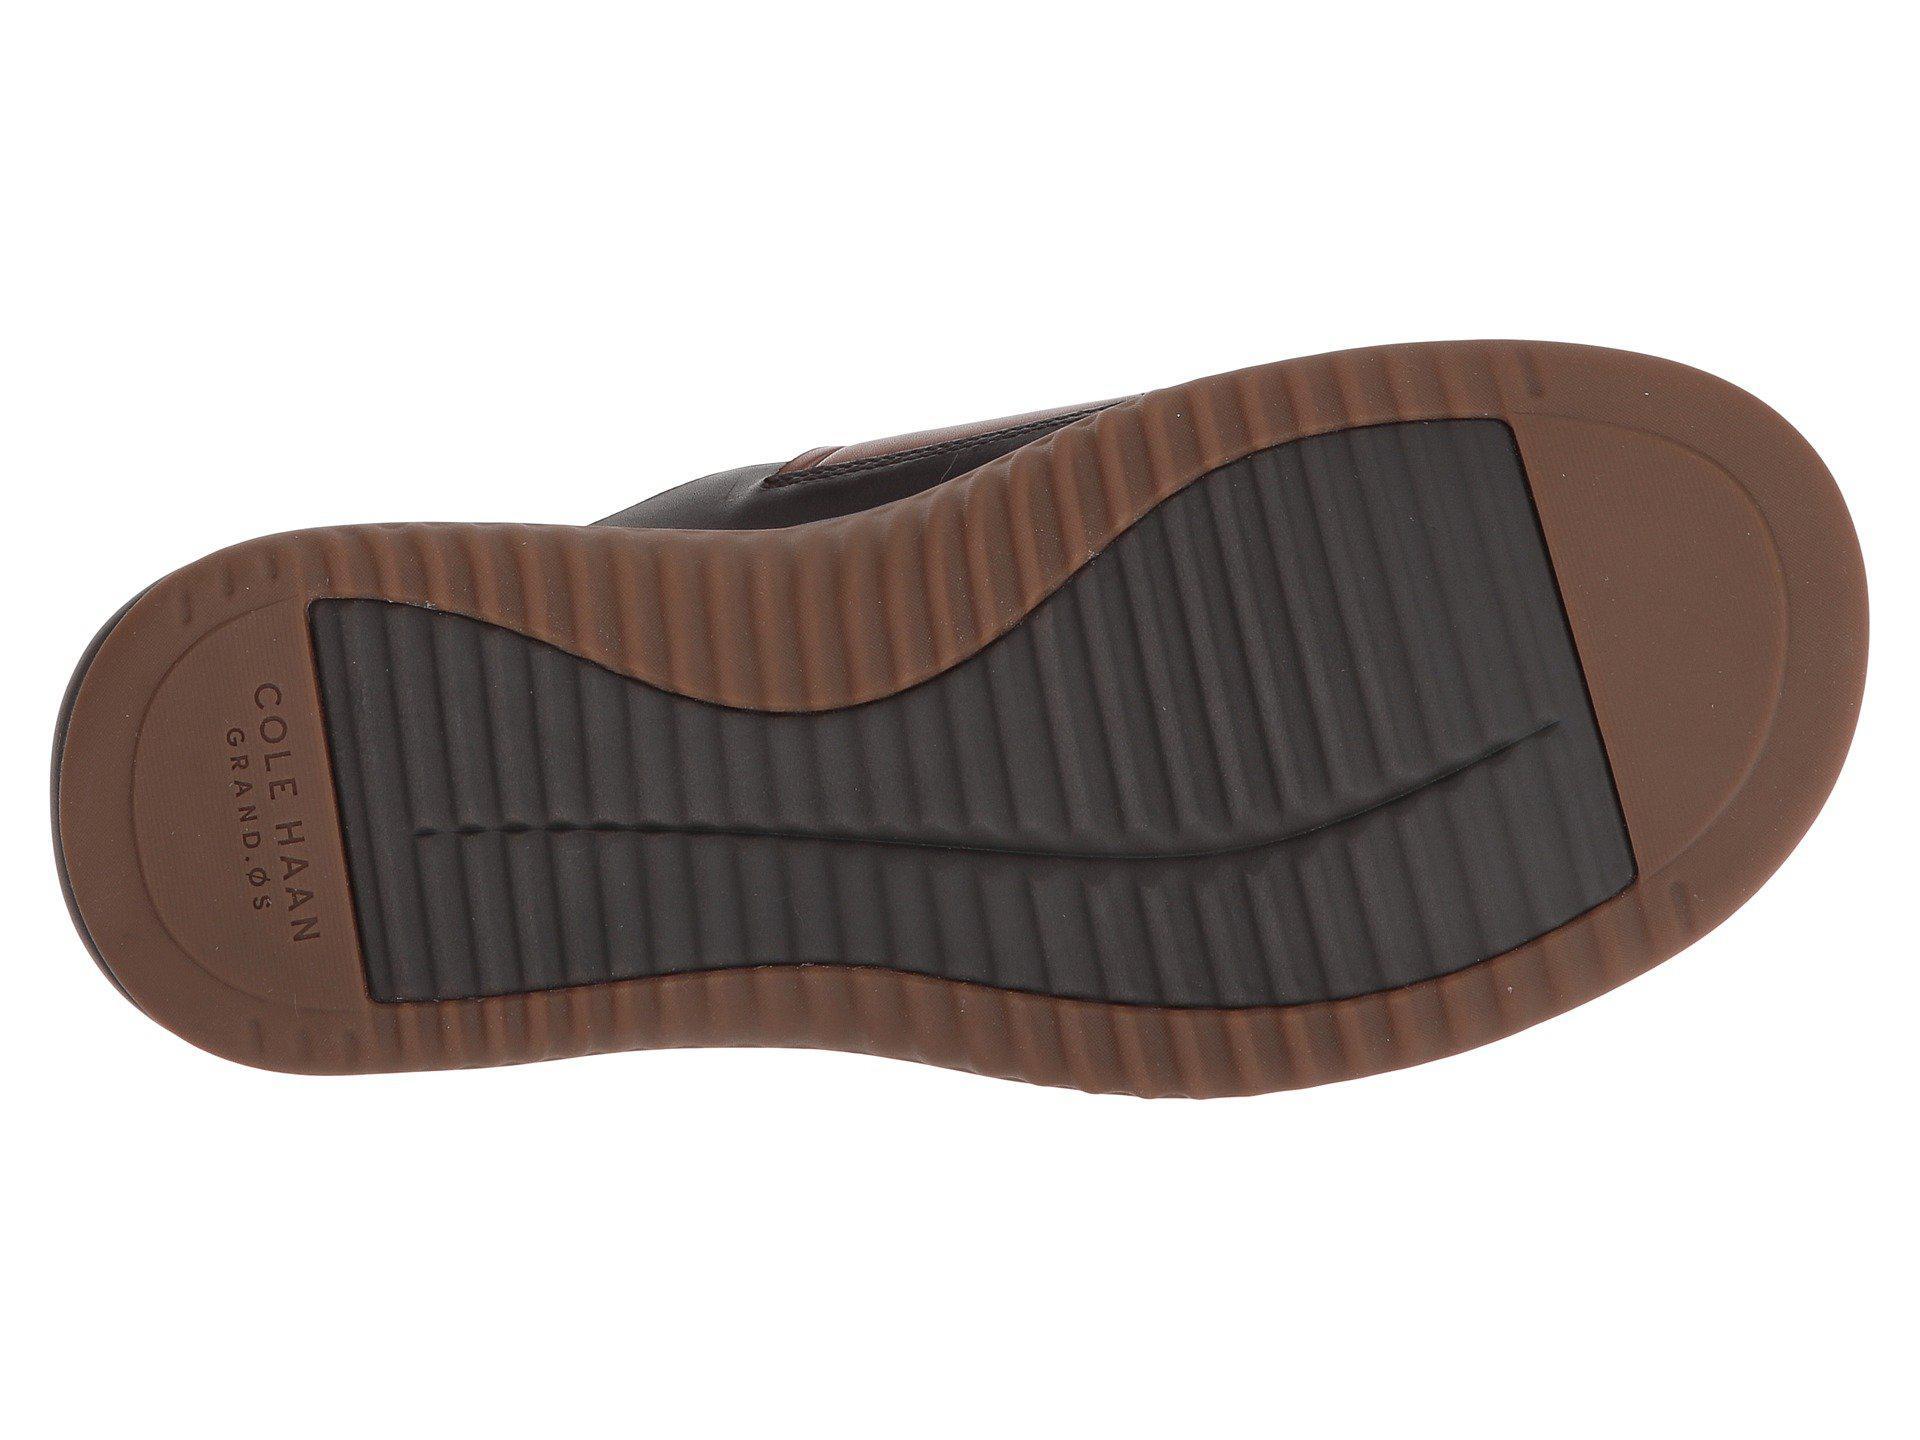 204ed28078e6 Lyst - Cole Haan 2.zerogrand Slide Sandal in Brown for Men